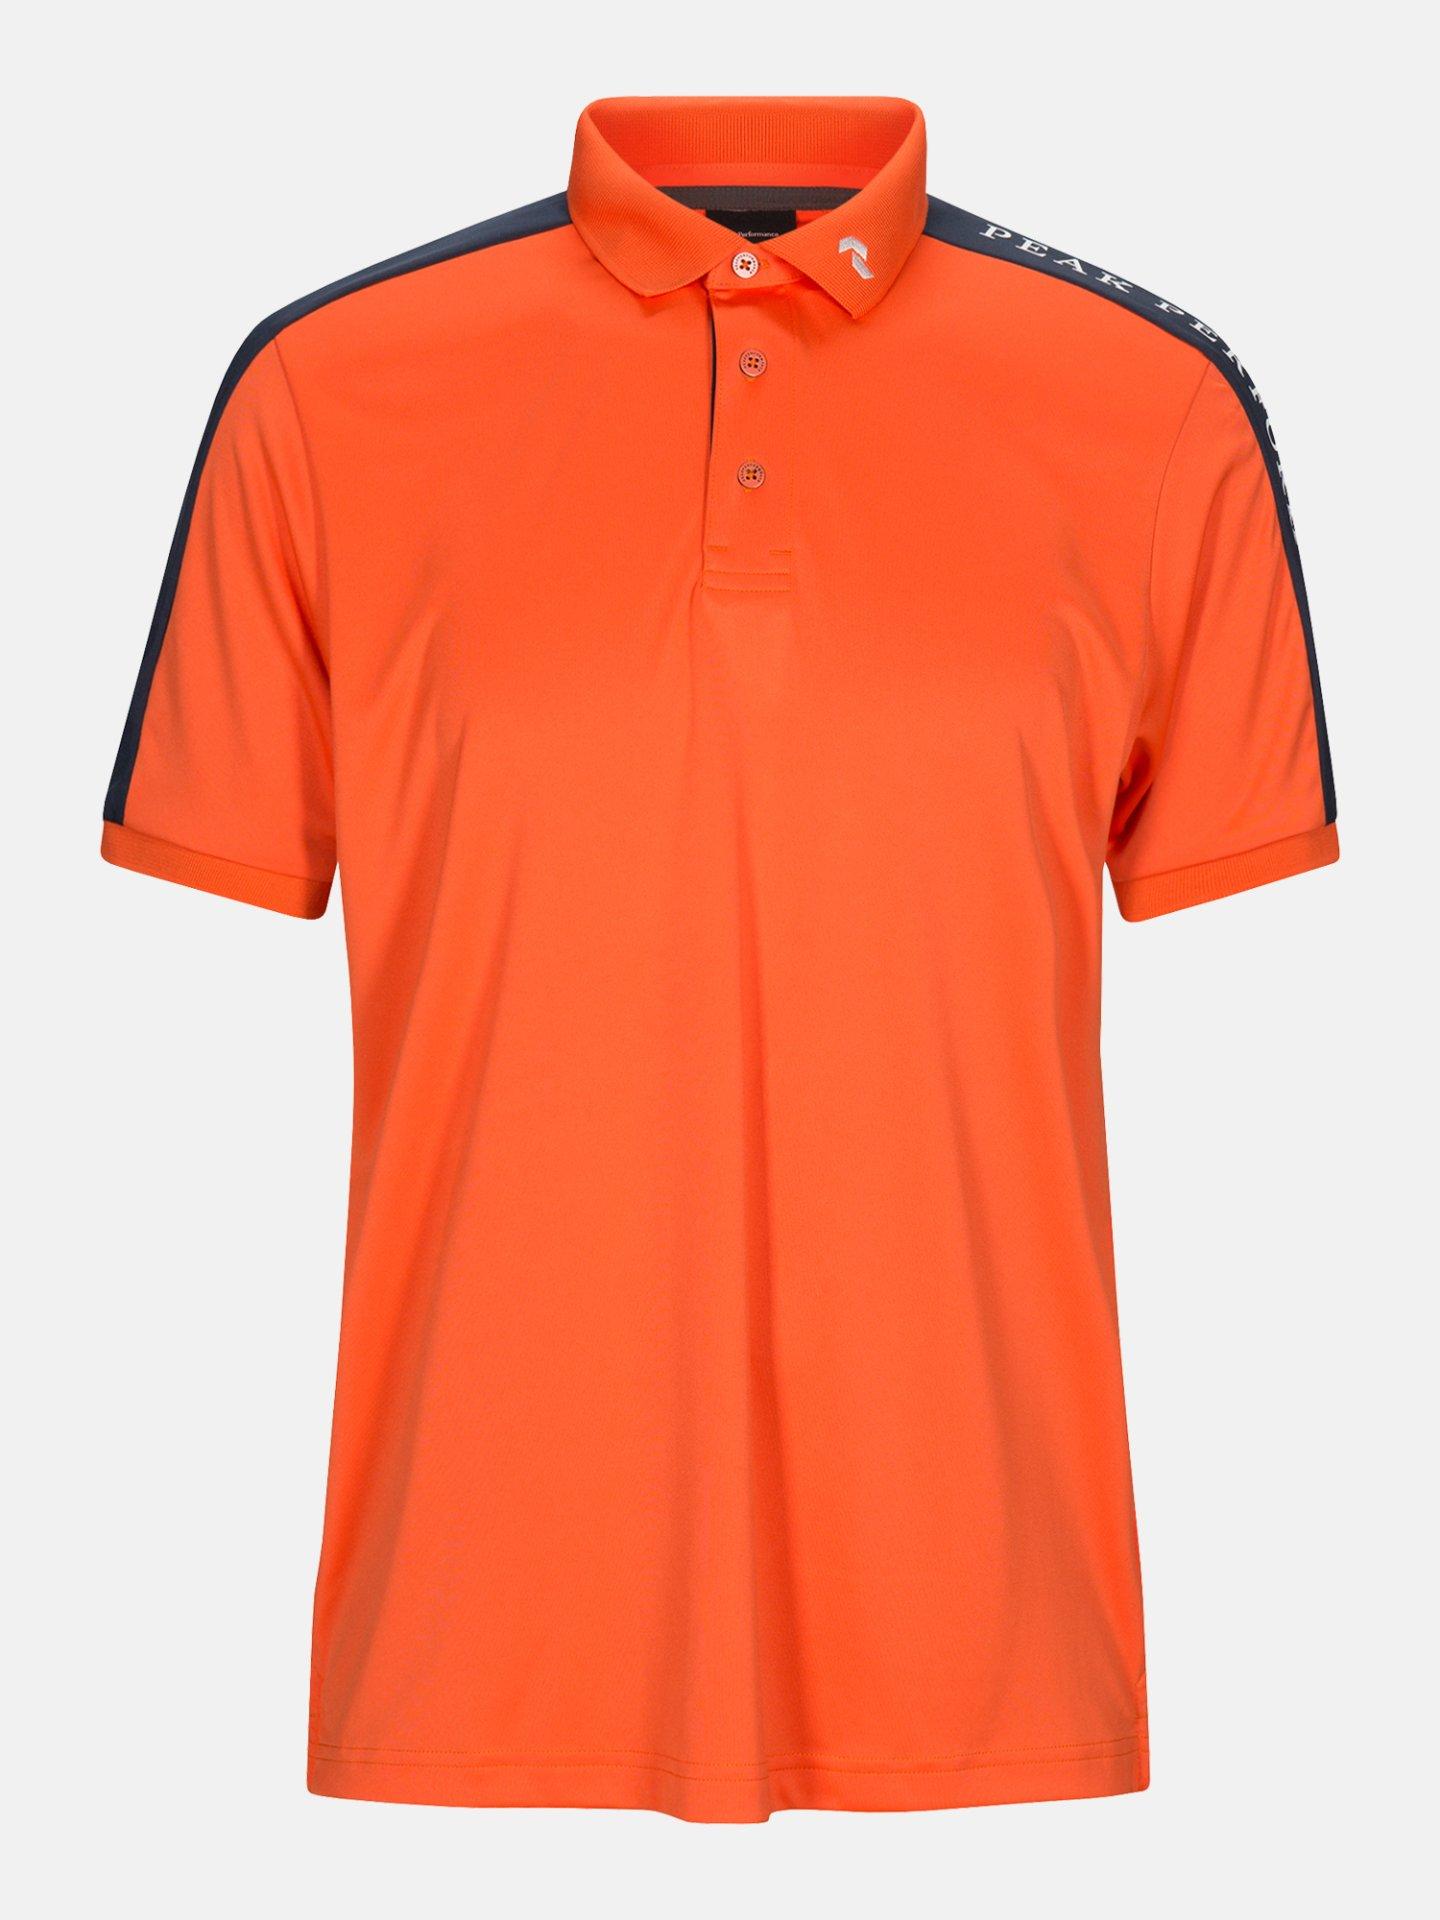 Peak Performance Golf Player Polo Vit